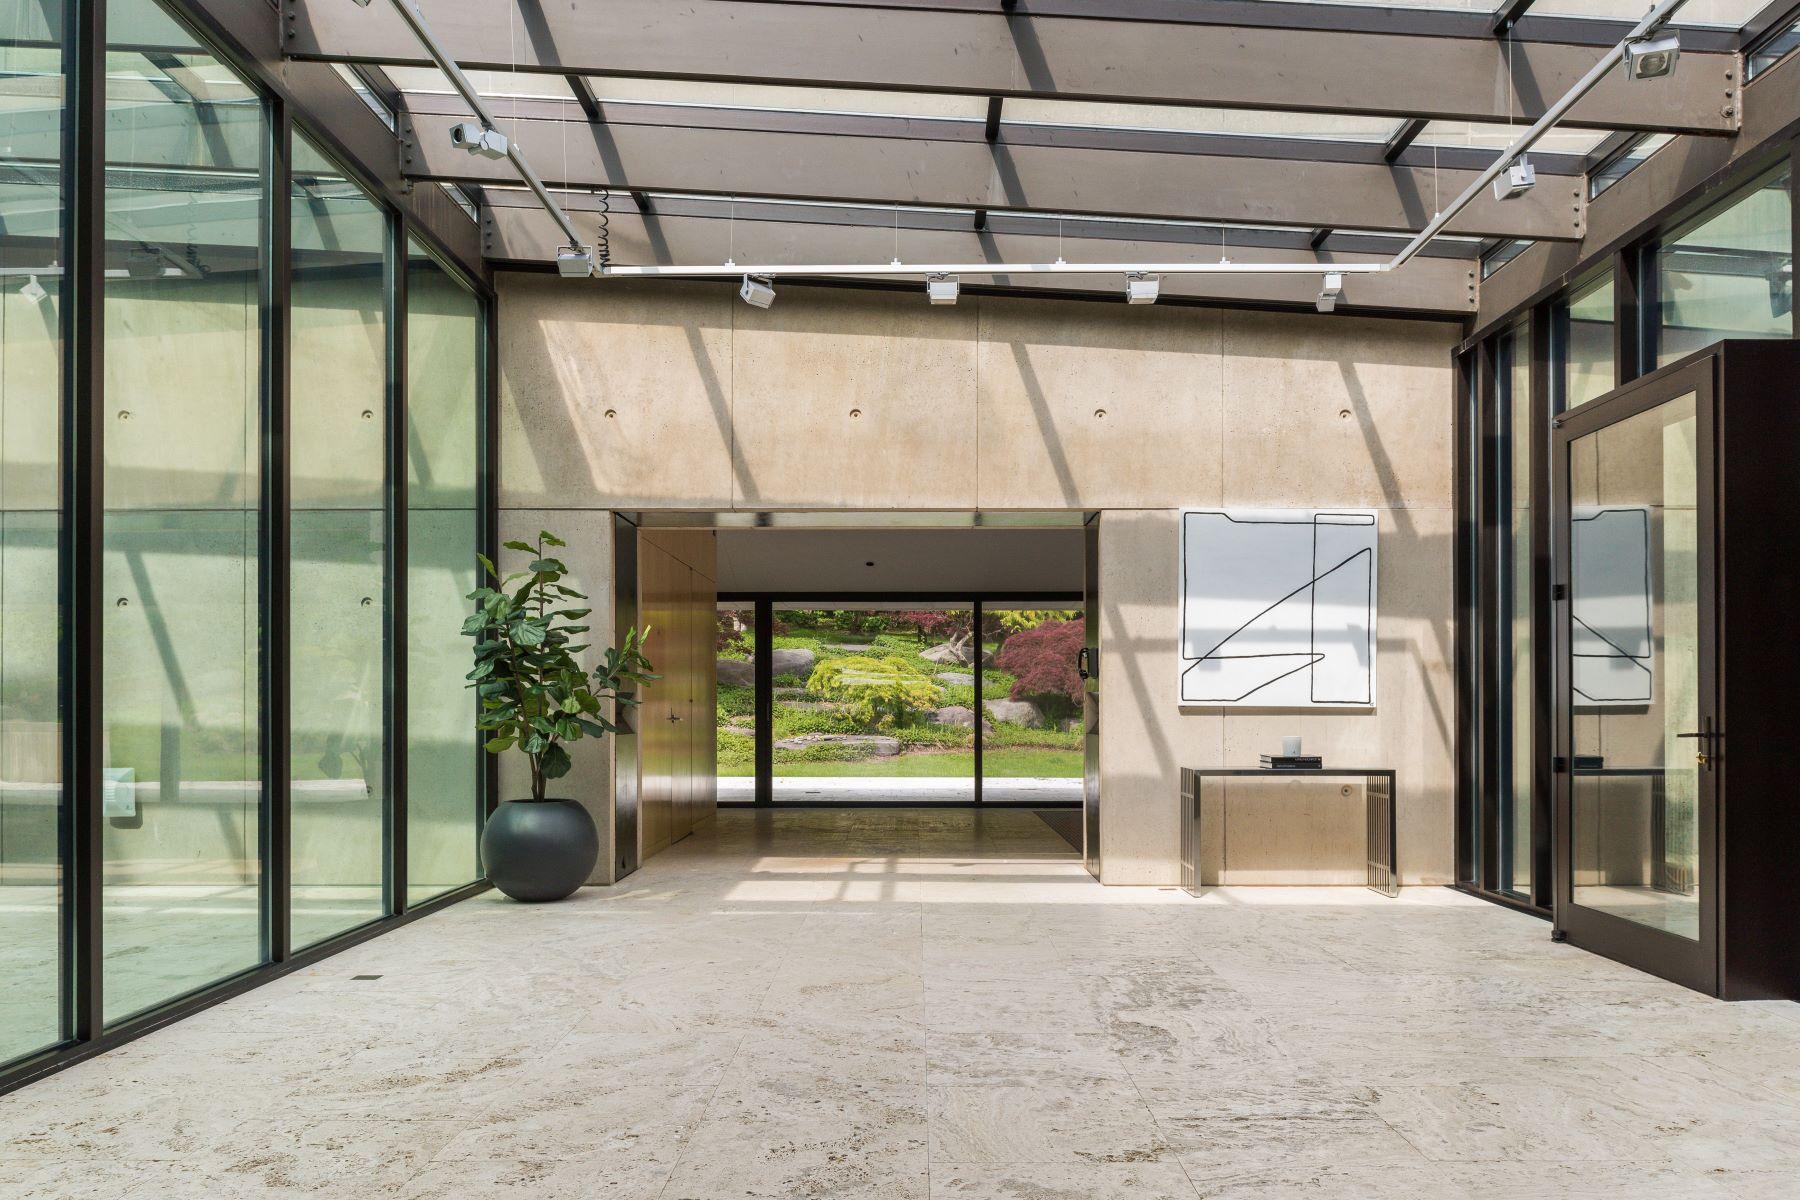 Additional photo for property listing at Fabulous Two Adjacent Properties 191 Ridgebury Road, Ridgefield, Connecticut 06877 Hoa Kỳ